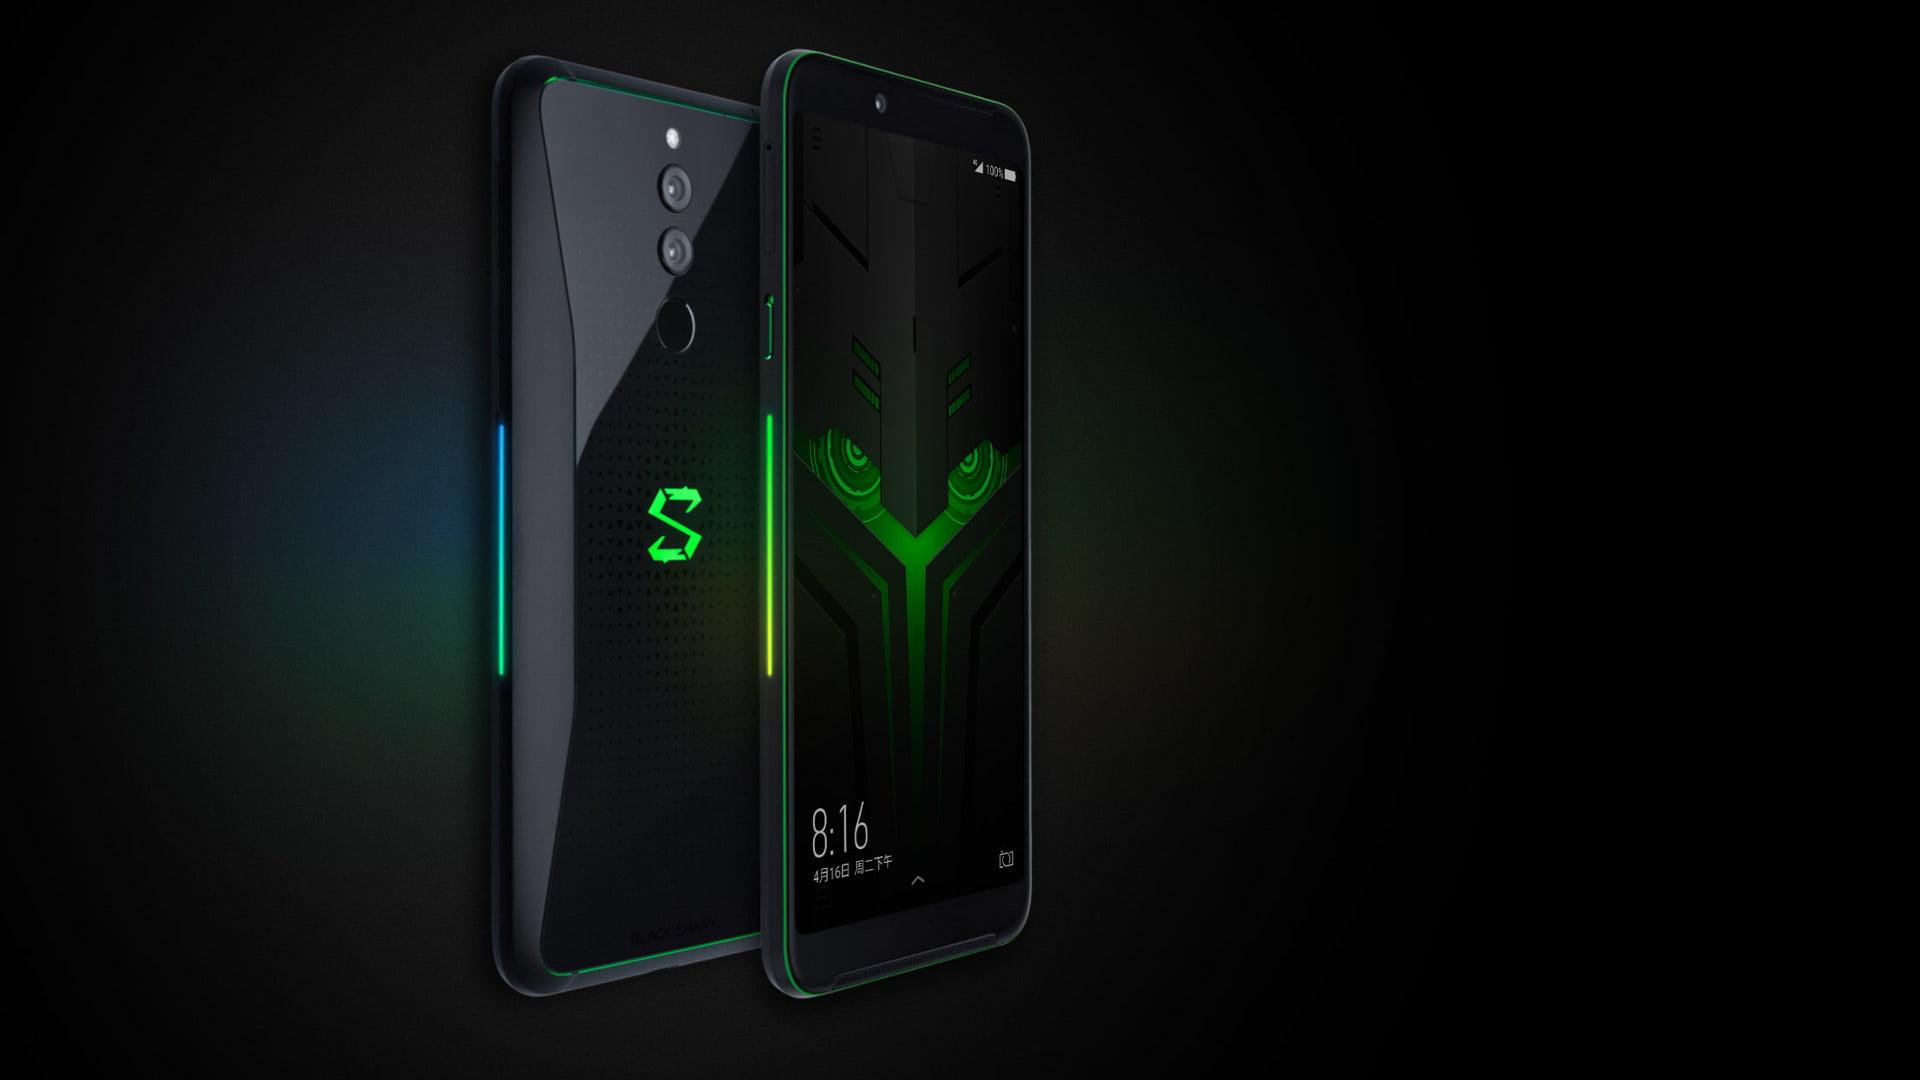 10GB RAM'a Sahip İlk Akıllı Telefon 'Xiaomi Black Shark Helo'